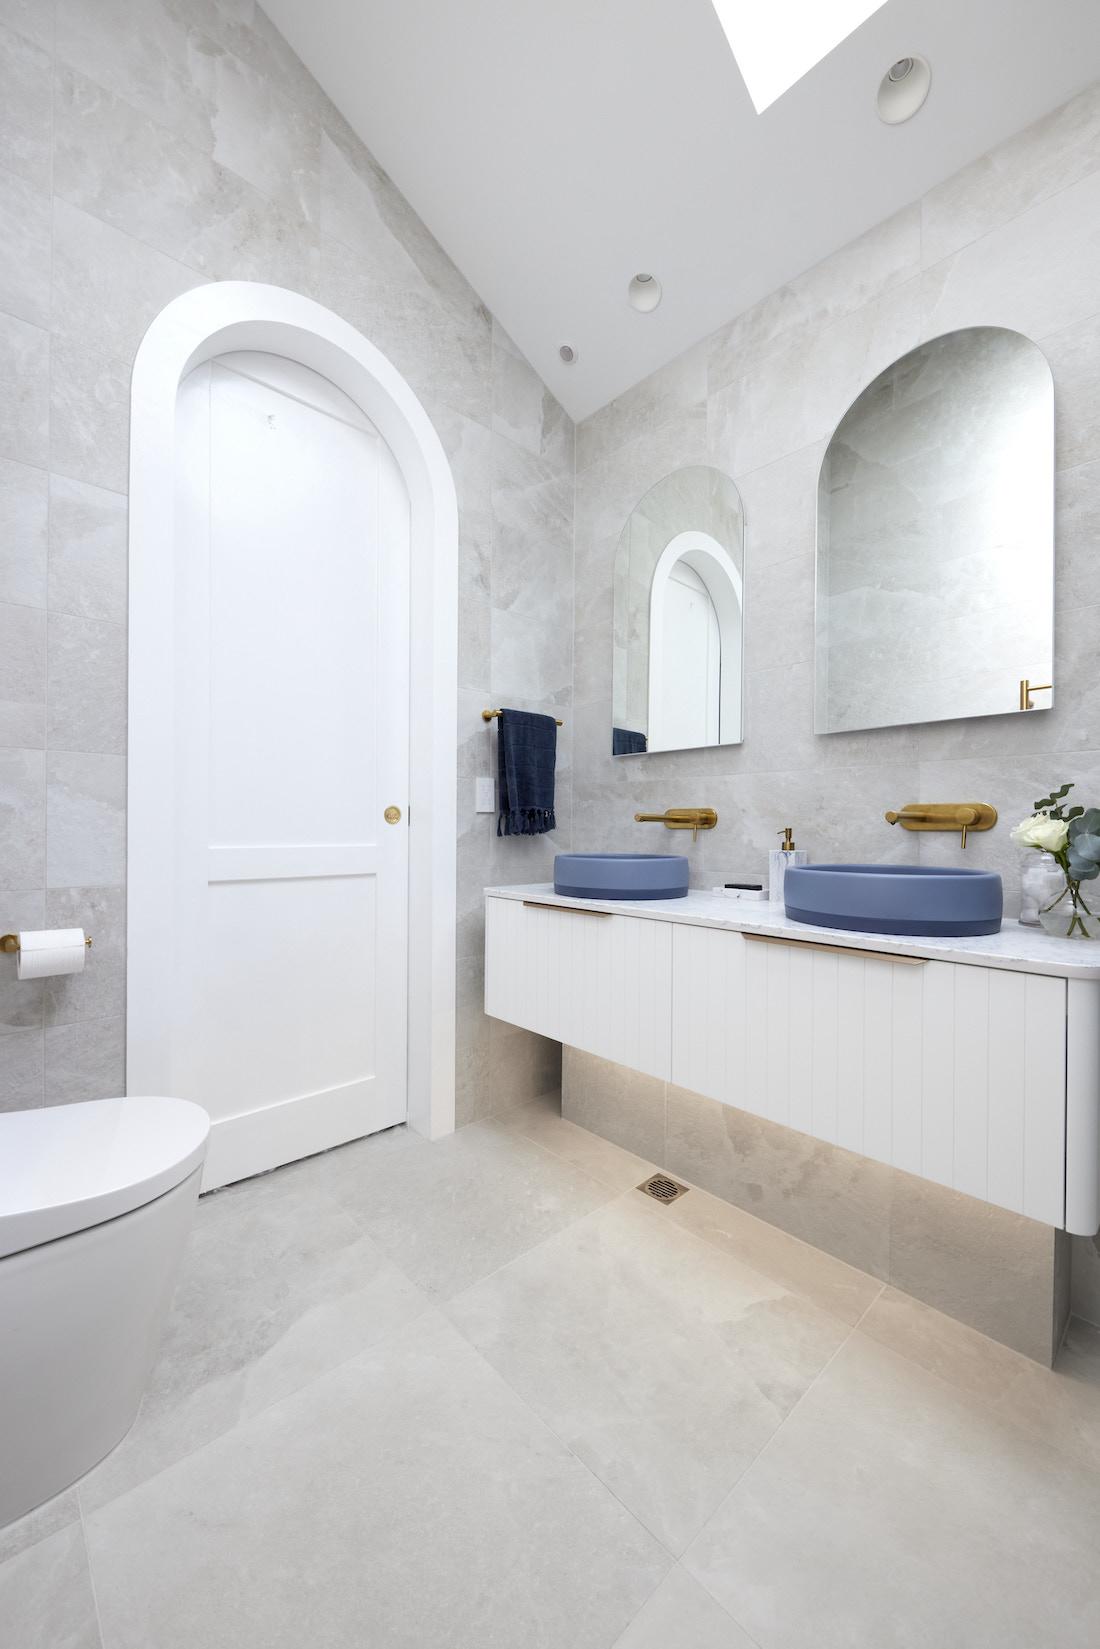 Arch doorway in bathroom with indigo blue basins